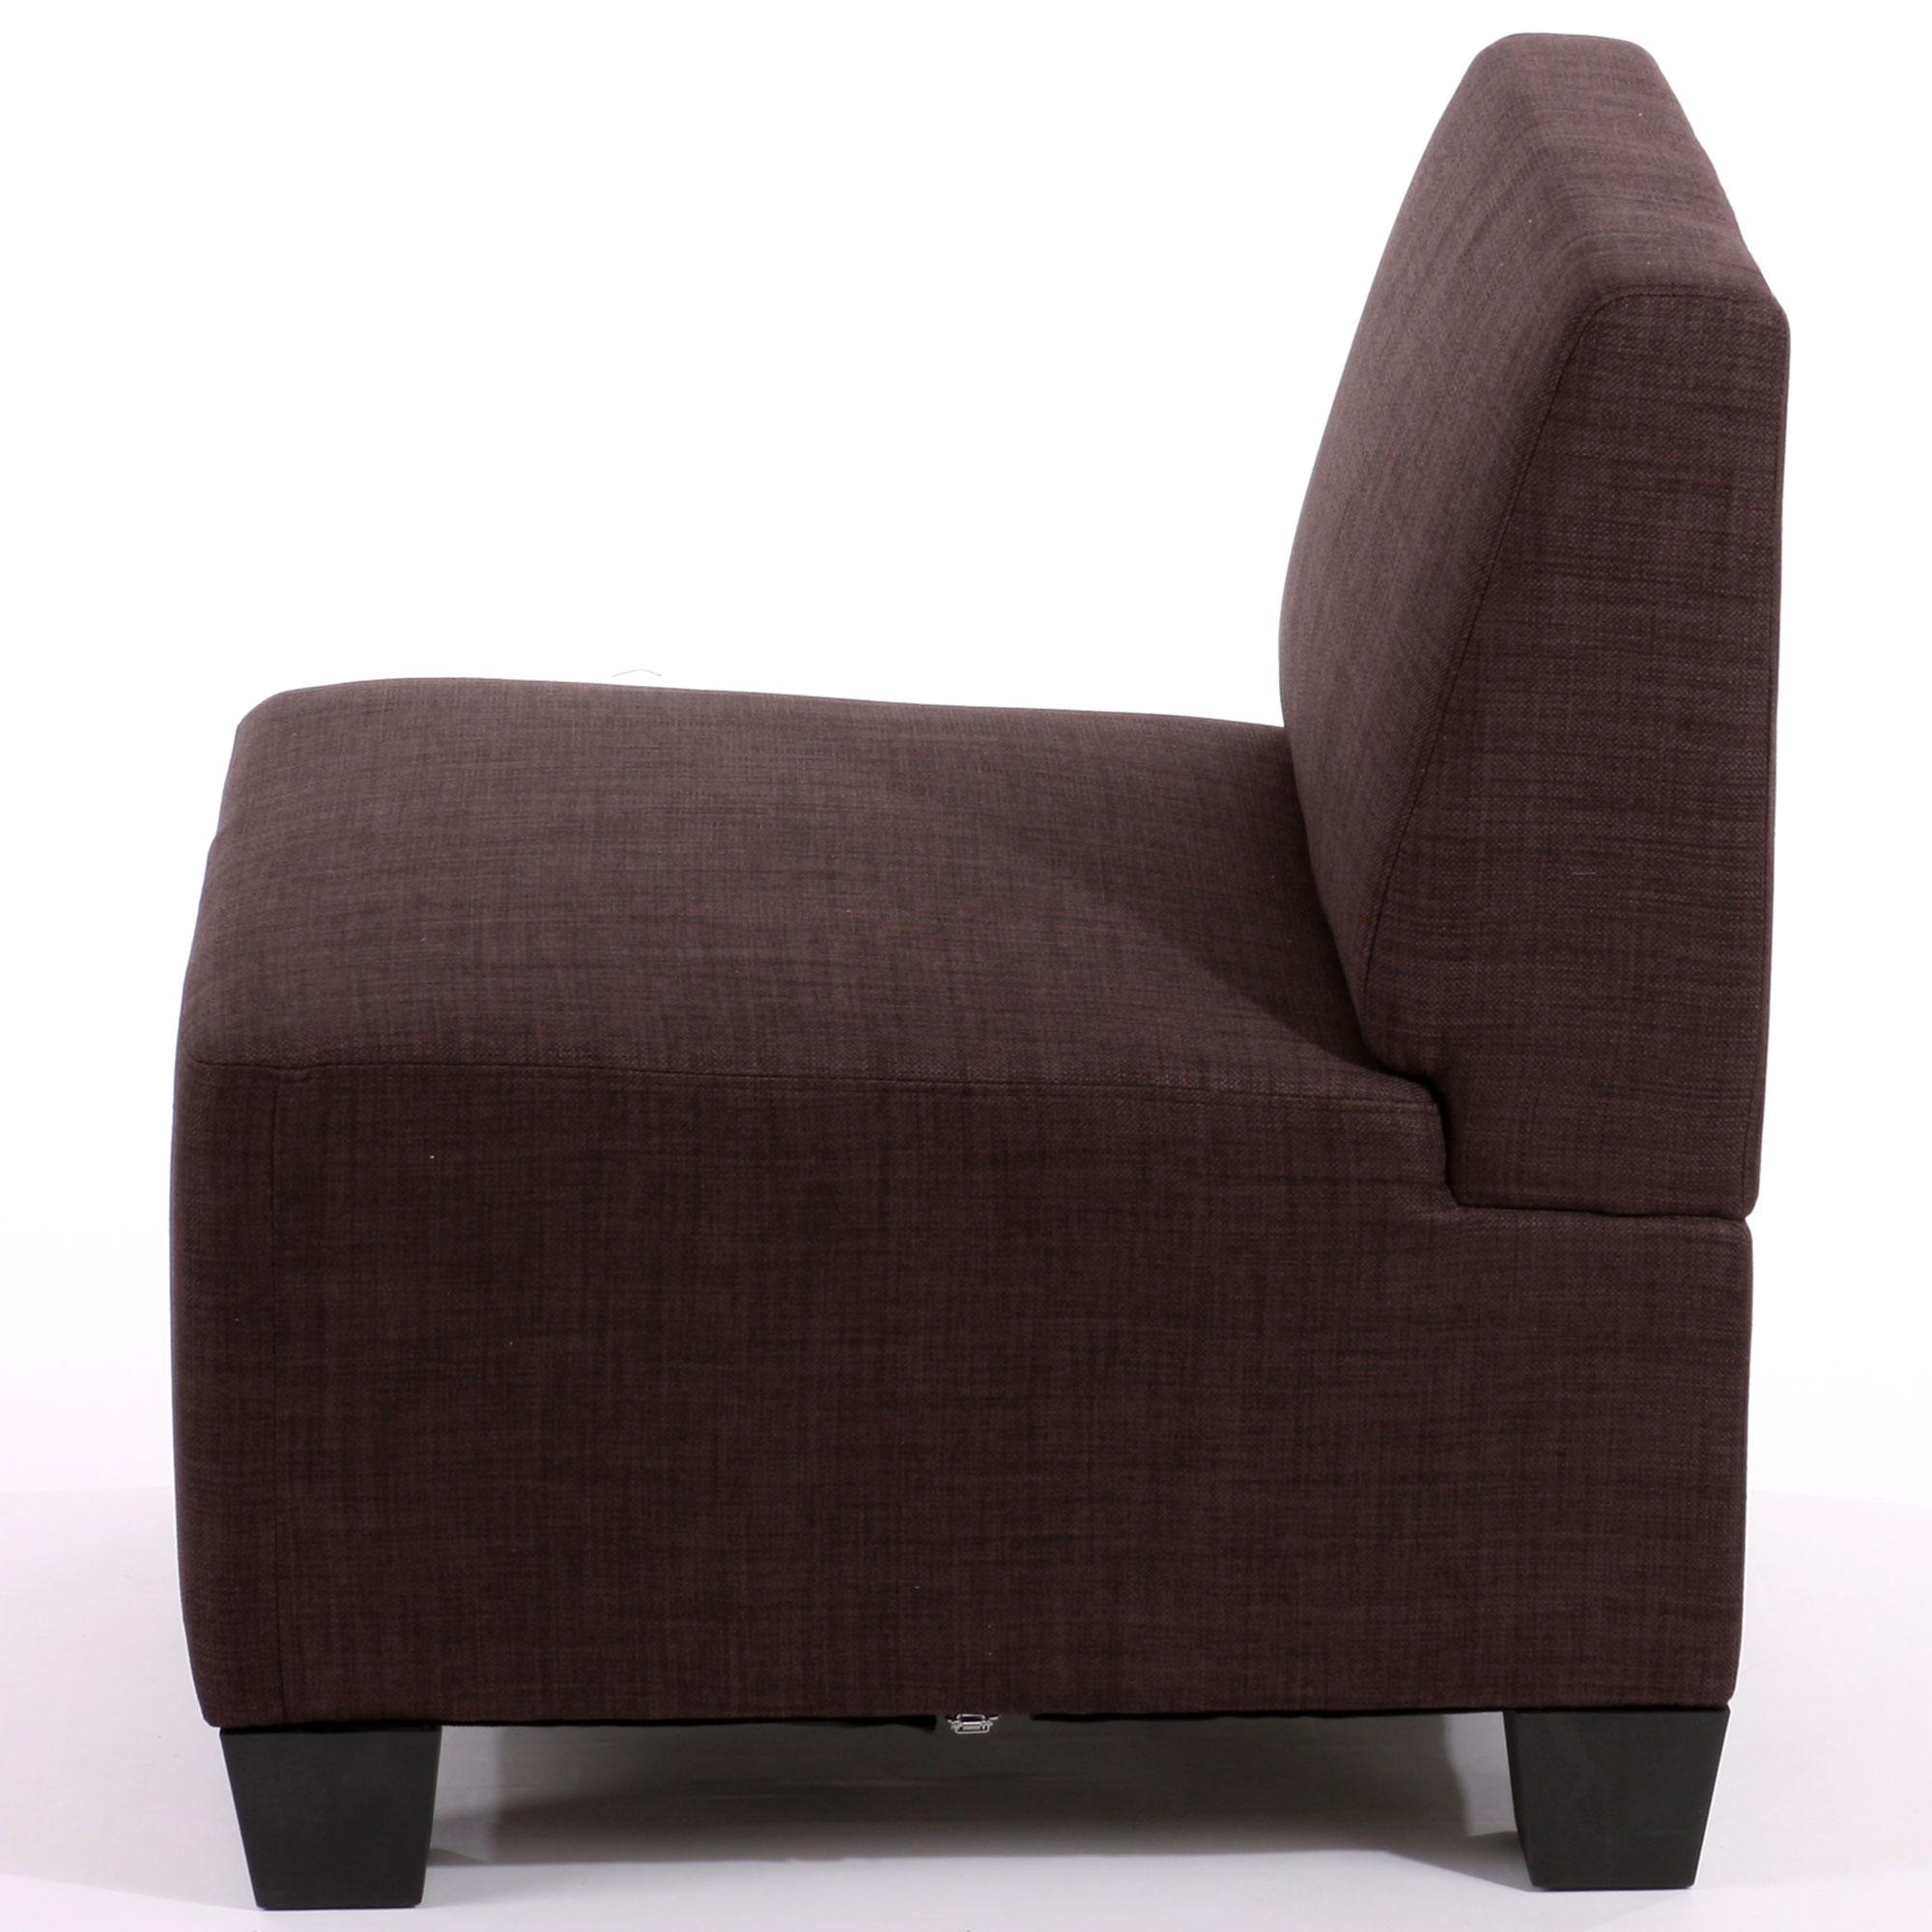 modular sofa lyon sessel ohne armlehnen textil braun ebay. Black Bedroom Furniture Sets. Home Design Ideas